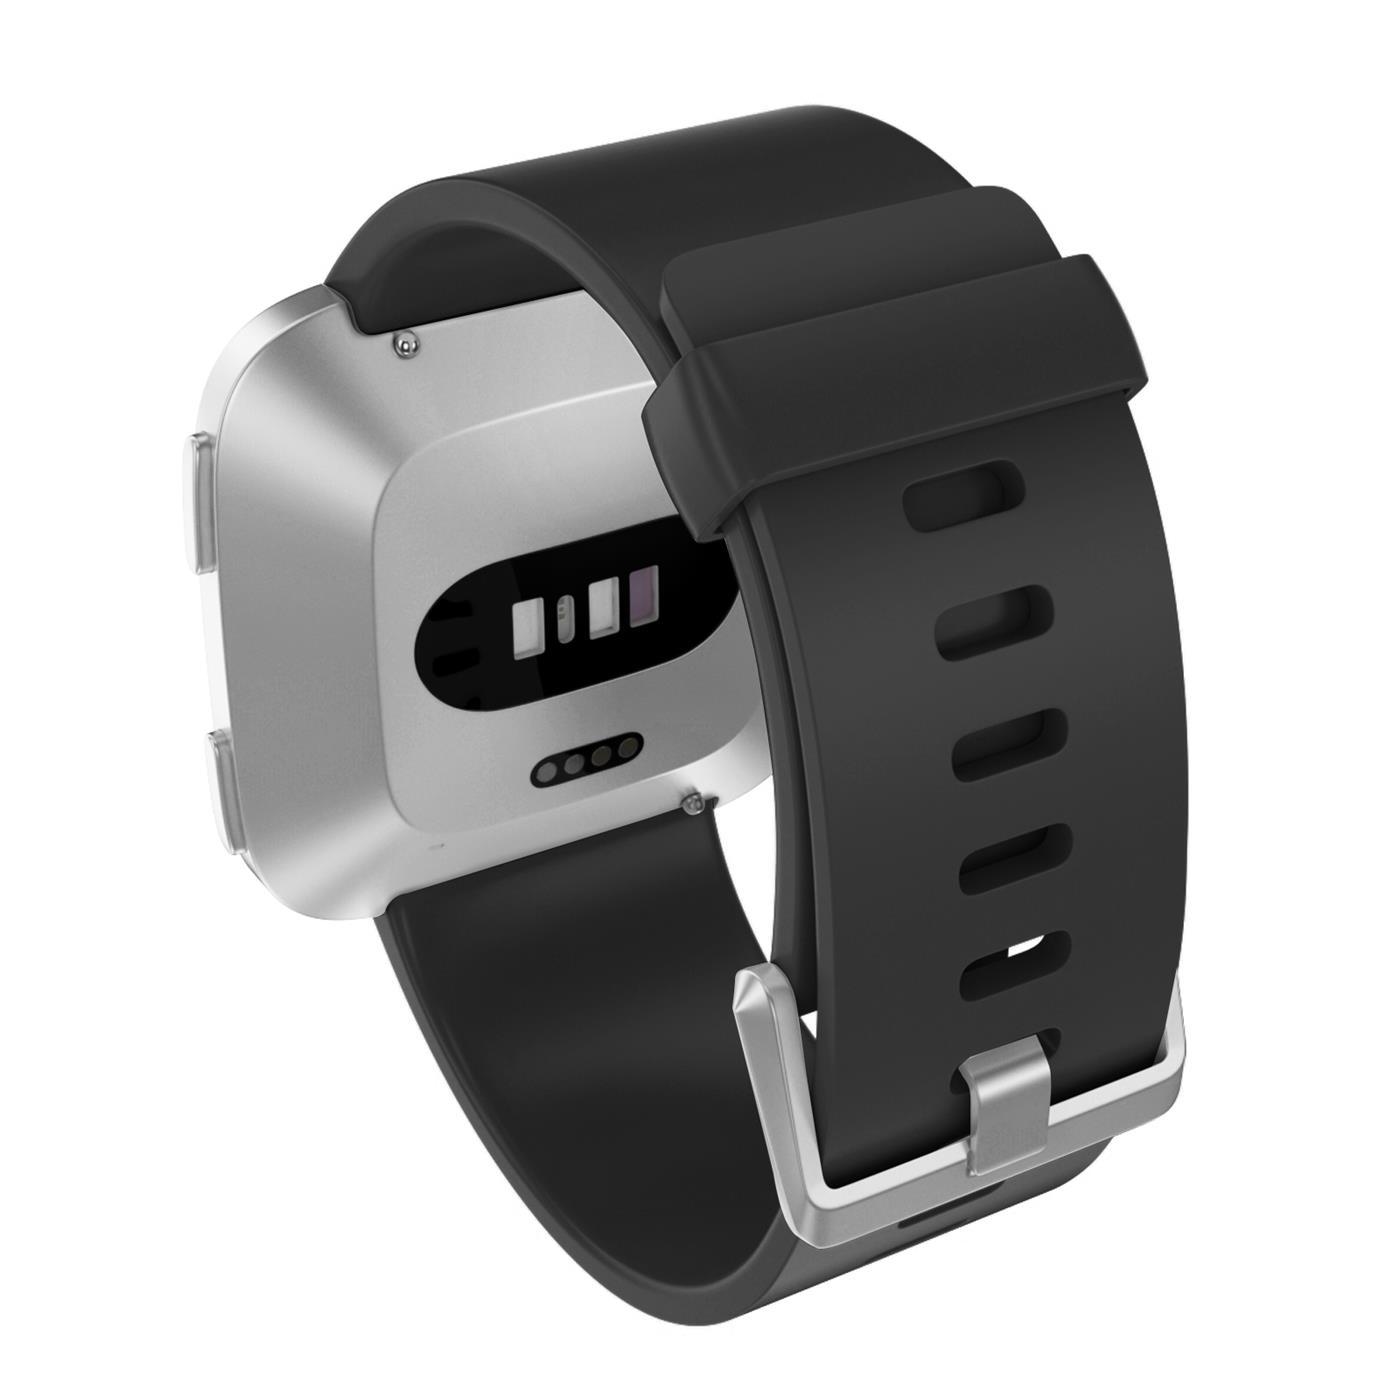 Fitbit-Groesse-S-oder-L-Ersatz-Silikon-Armband-Uhren-Sport-Band-Fitness-Tracker Indexbild 39